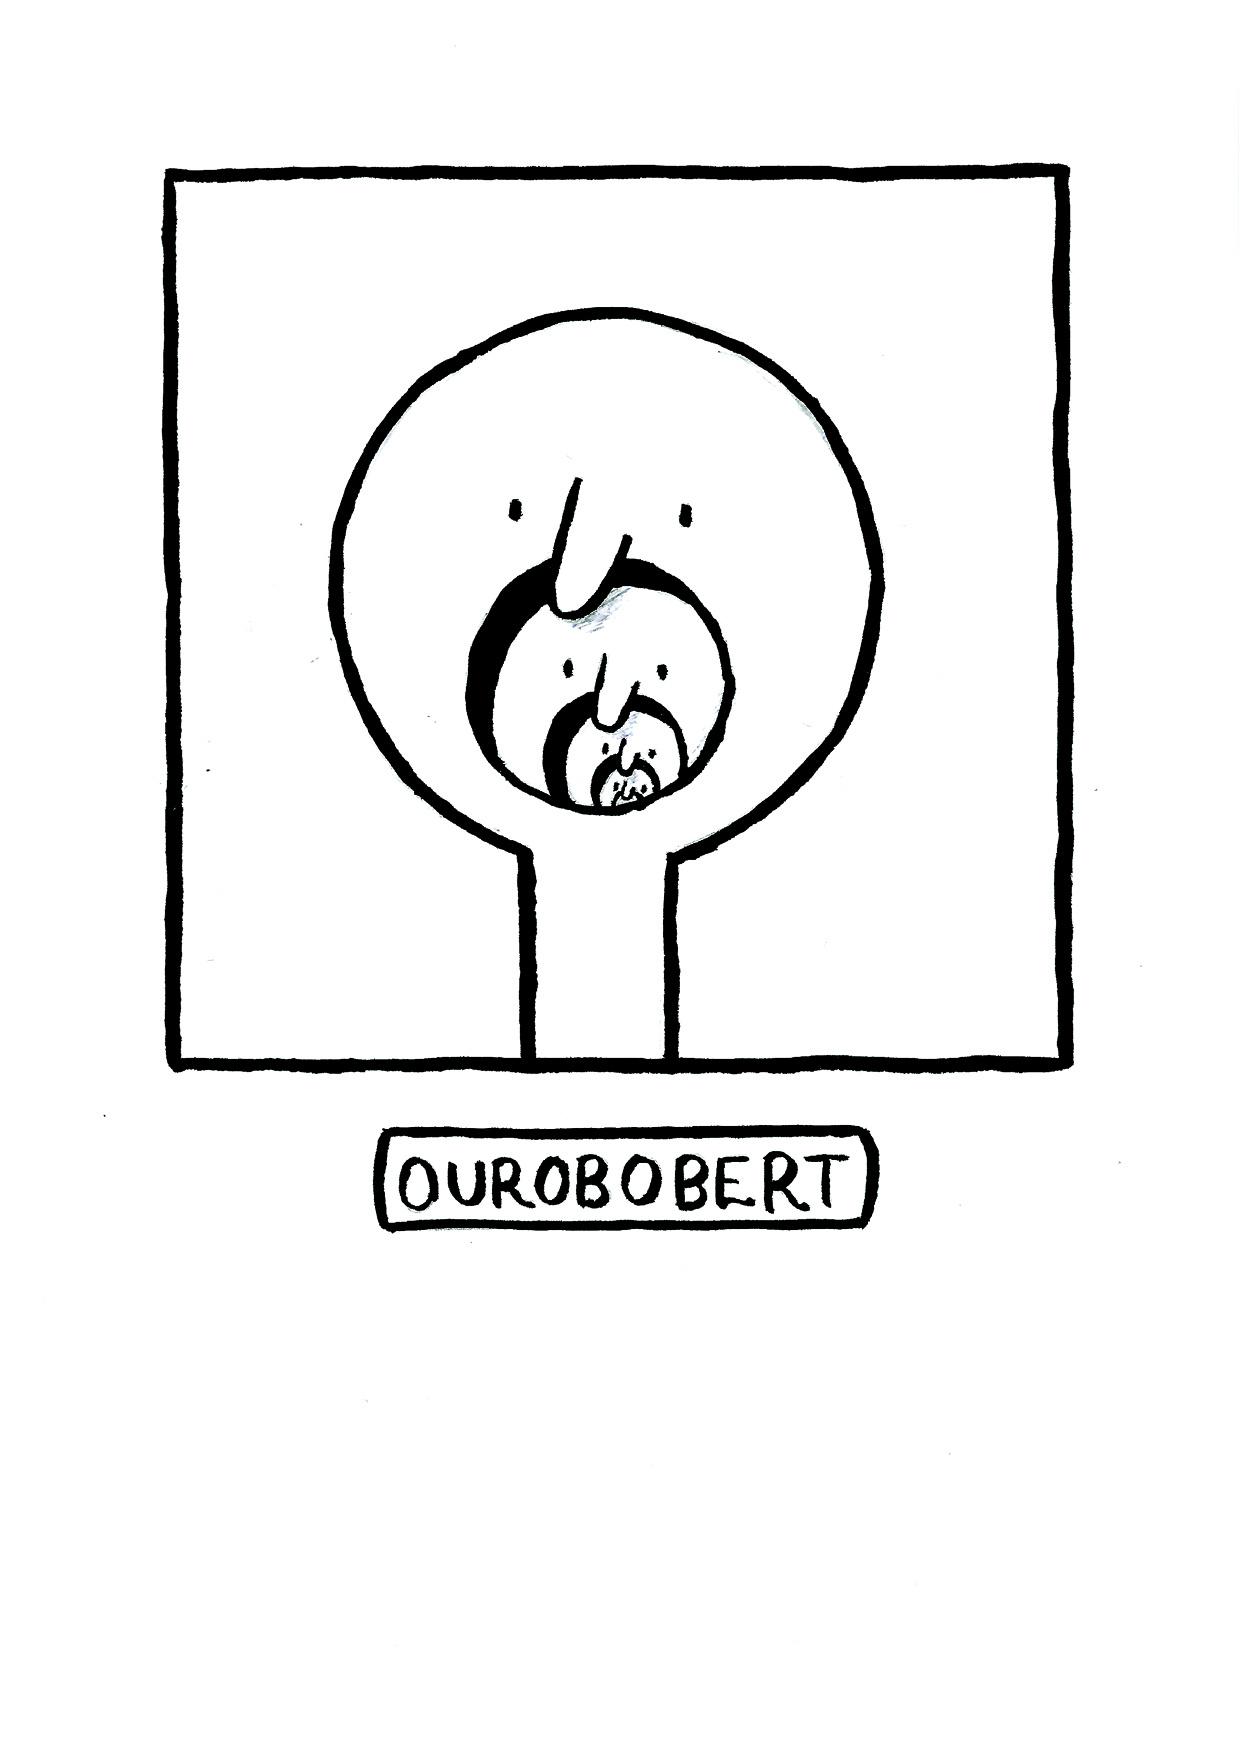 Ourobobert